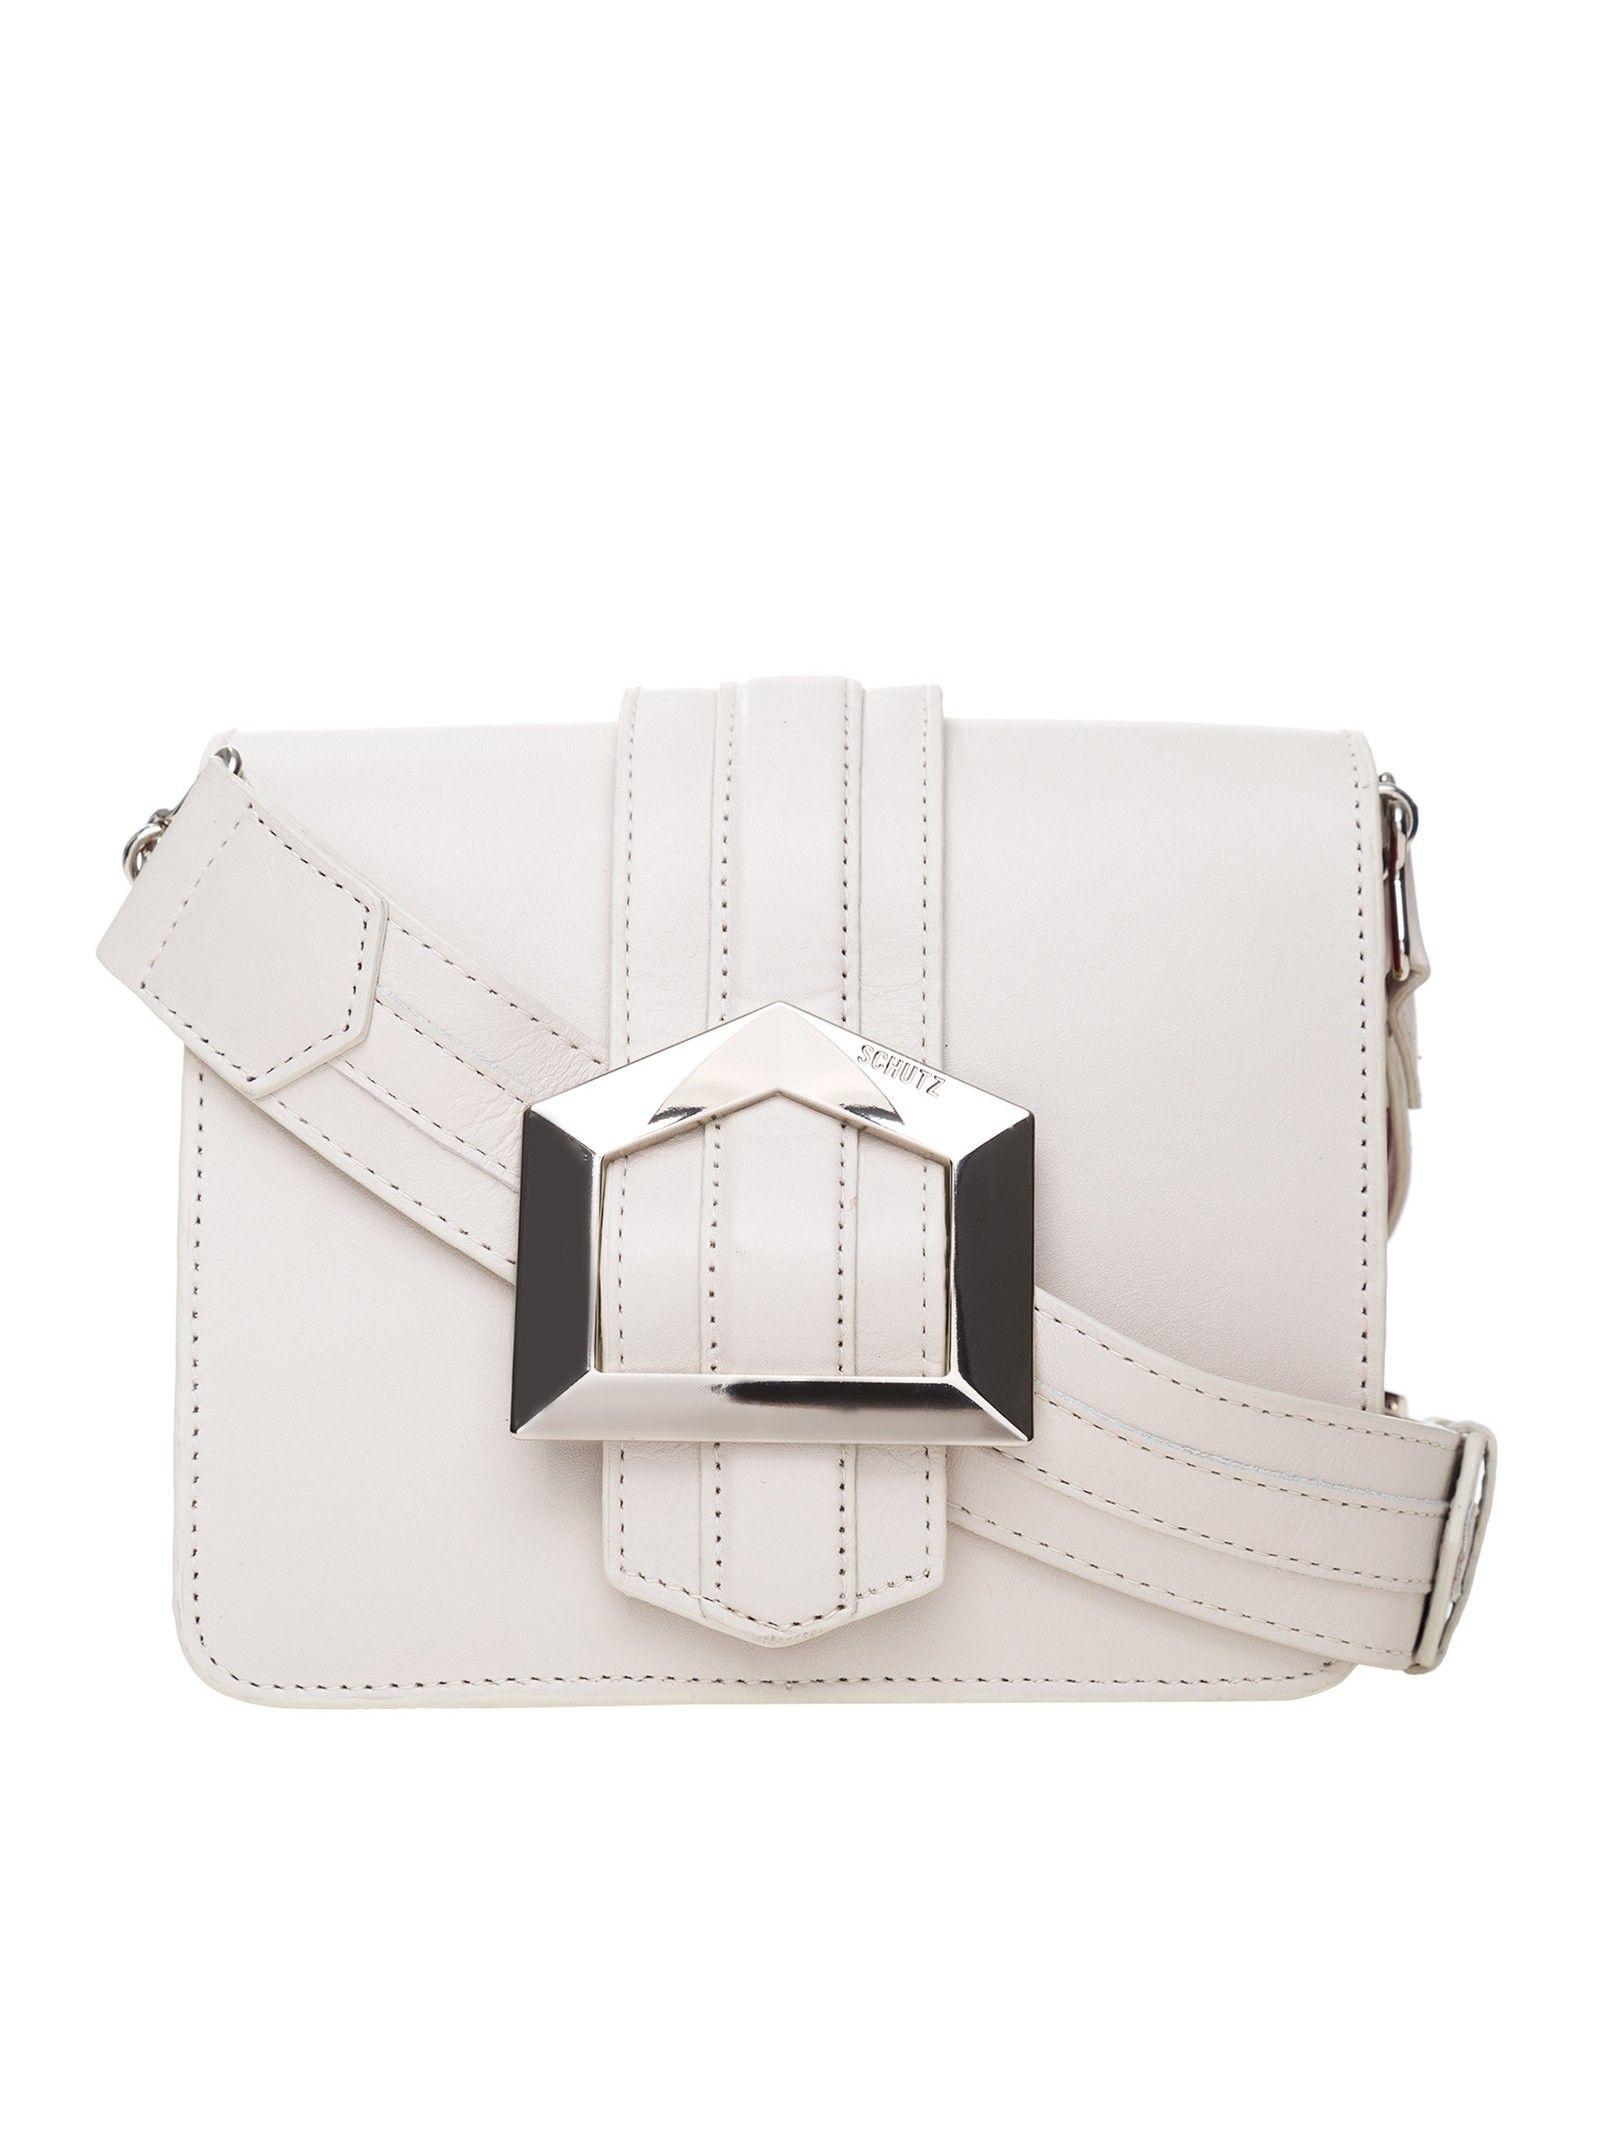 7905737e3 BOLSA NAPA GLOVE - OFF WHITE   Bag envy   Bags, Girls bags, Chloe bag